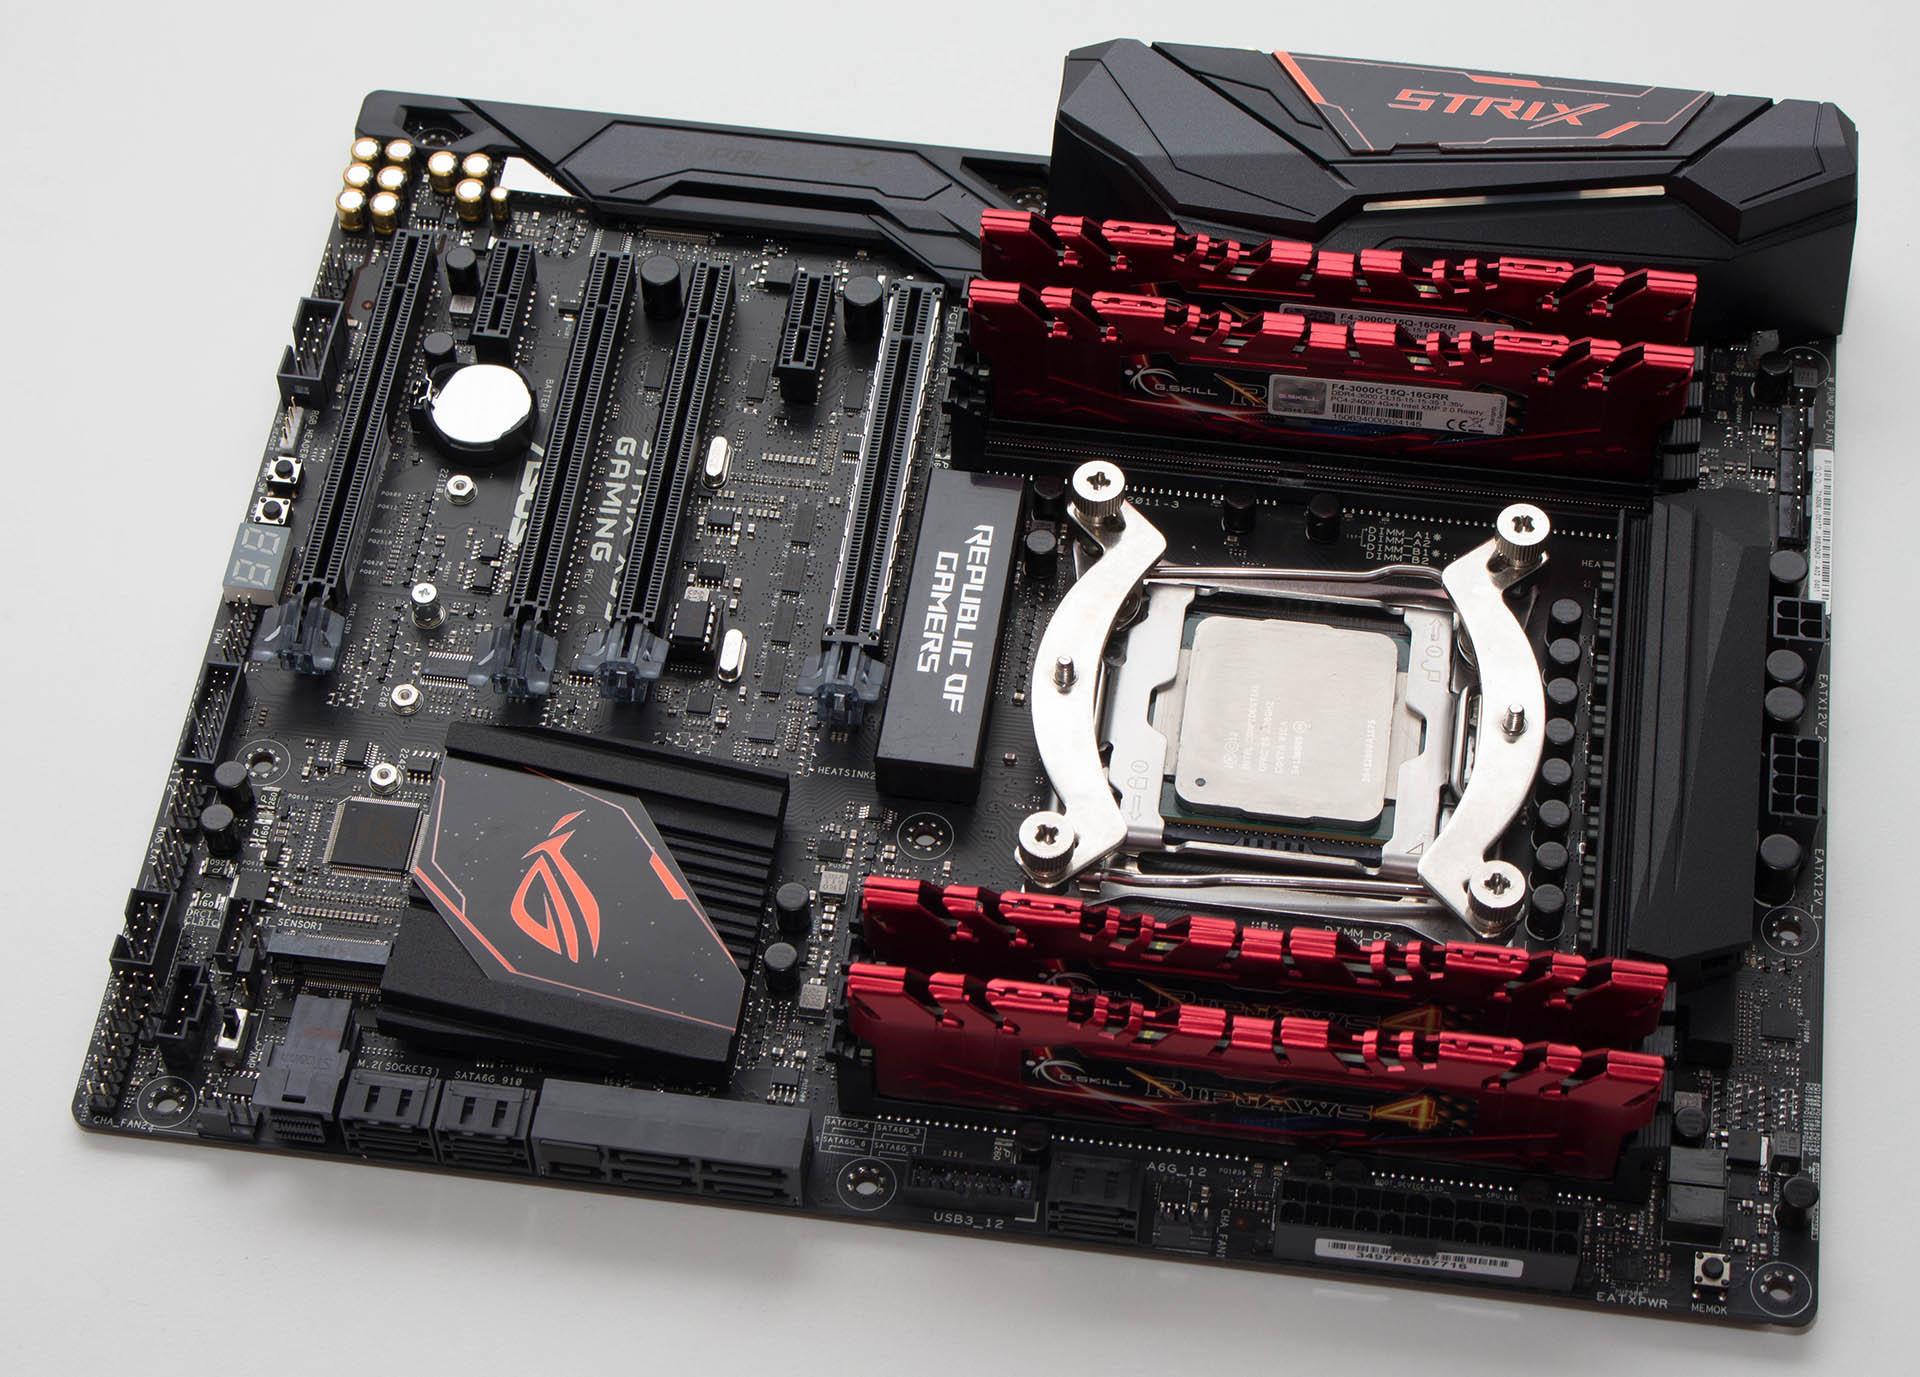 Asus Strix X99 Gaming – brzi test